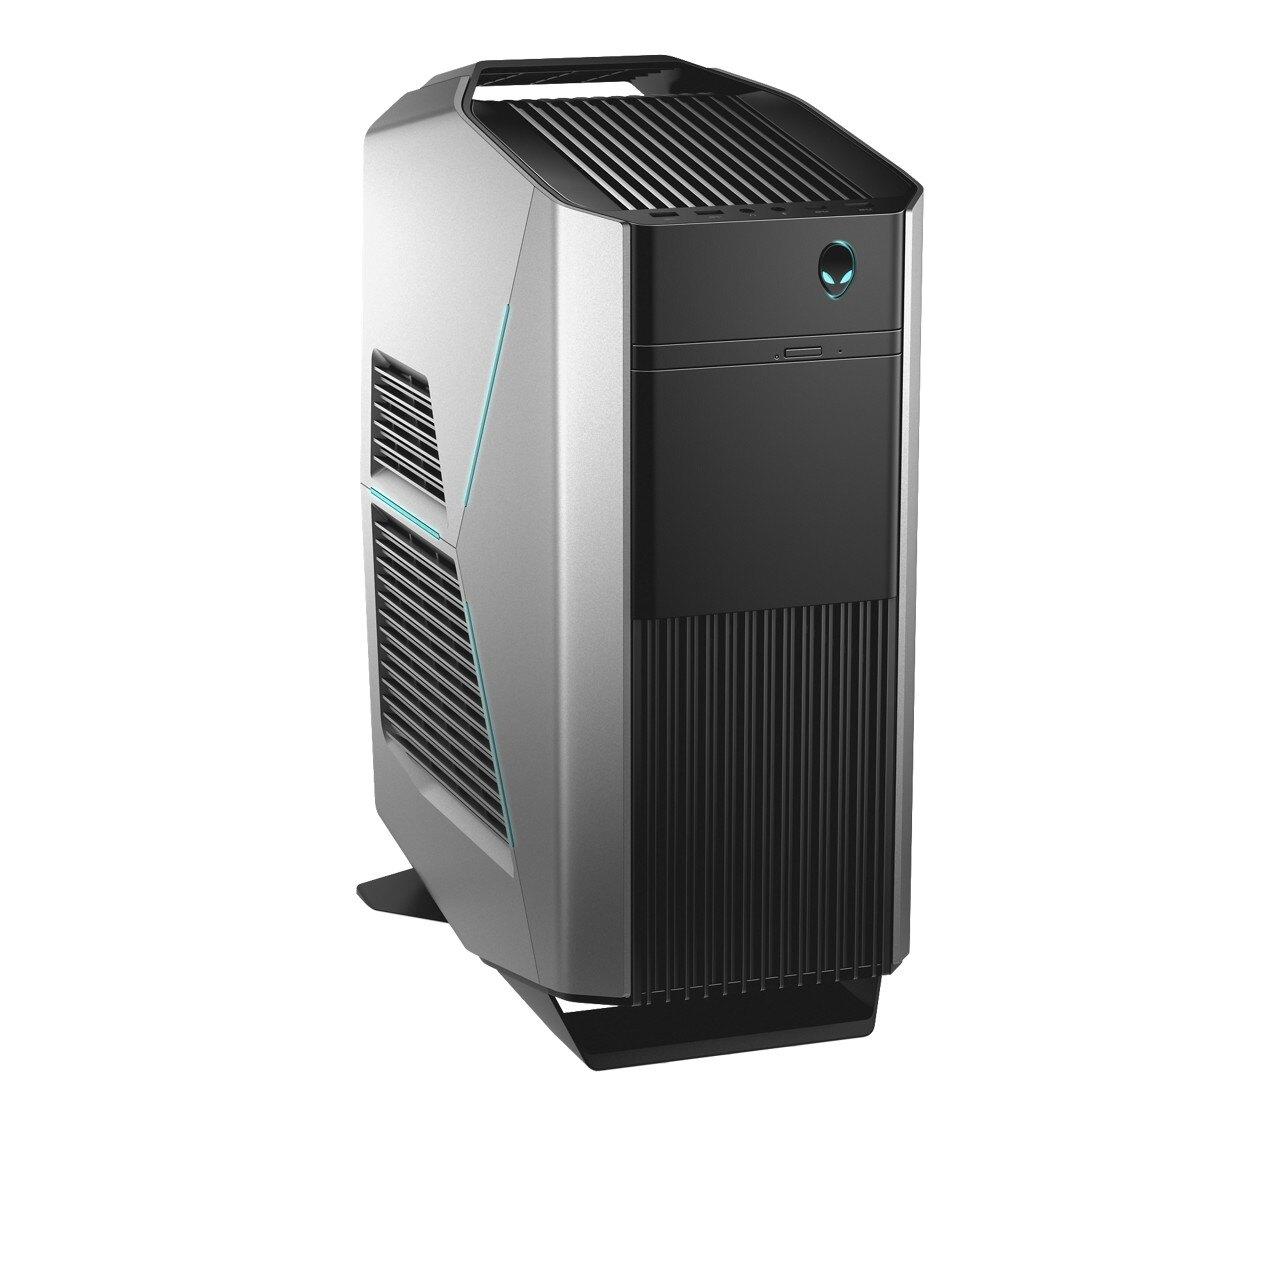 Alienware aurora r8 gaming desktop intel i7 9700k nvidia rtx 2080 Super 1T ssd 16gb ram - $1550 (+ $465 in points)